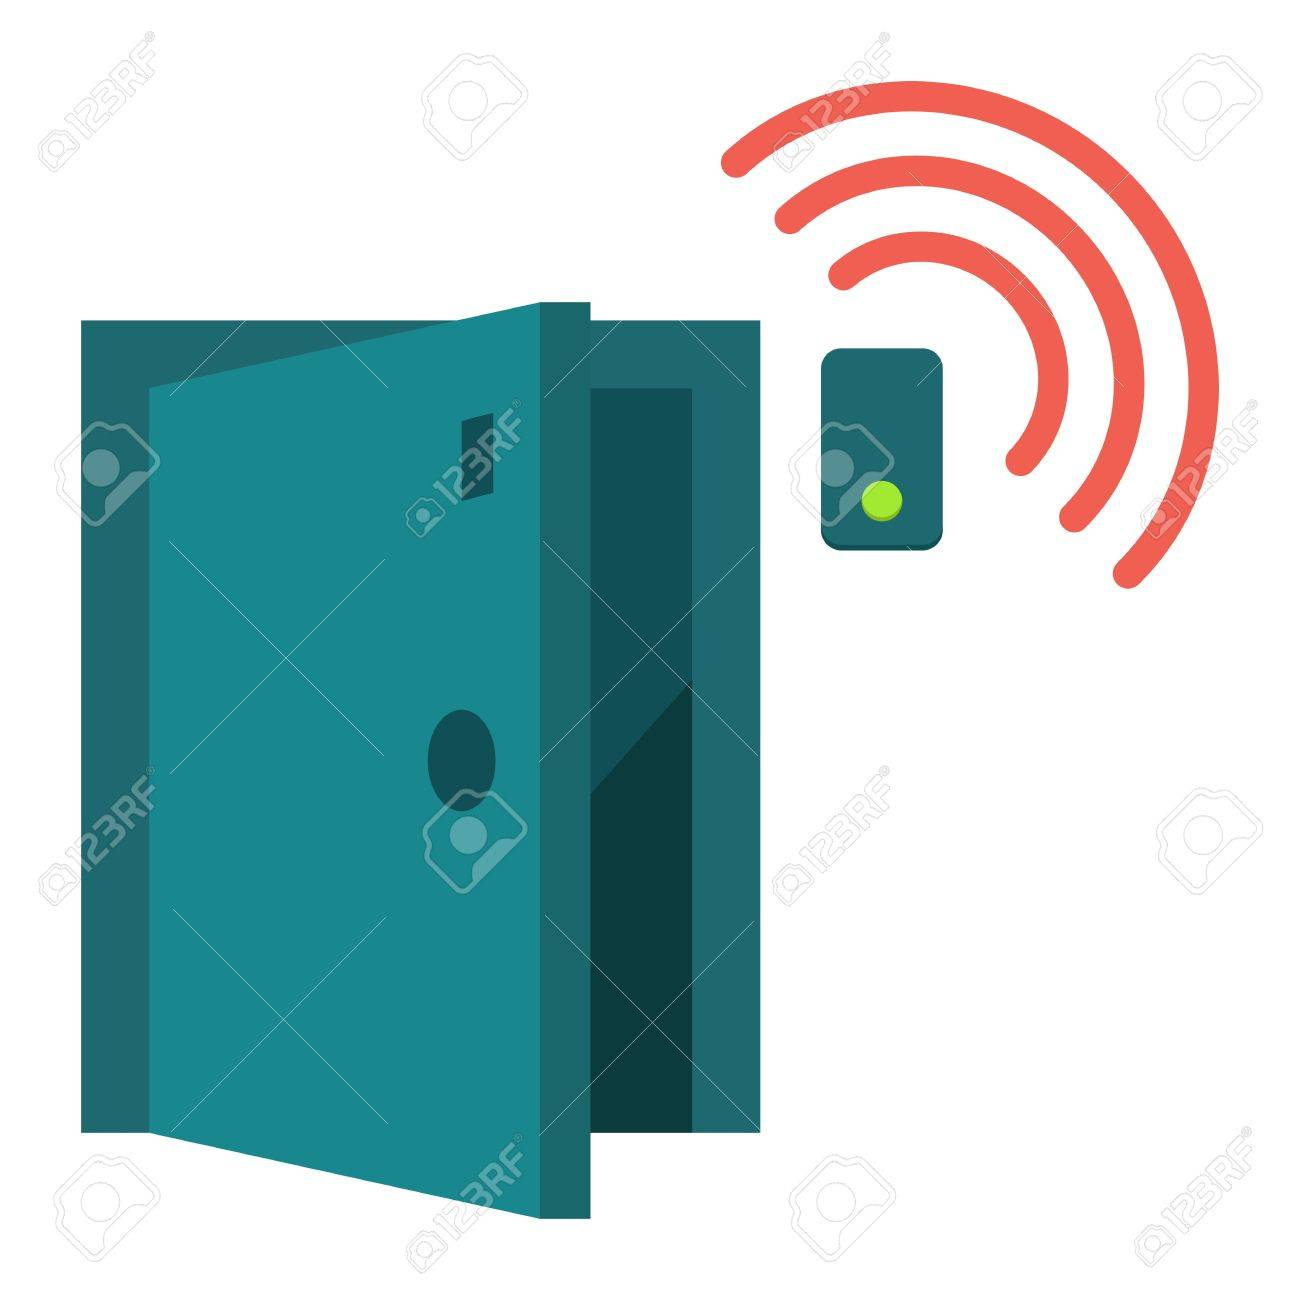 Door sensor flat icon, security and alarm, vector graphics, a